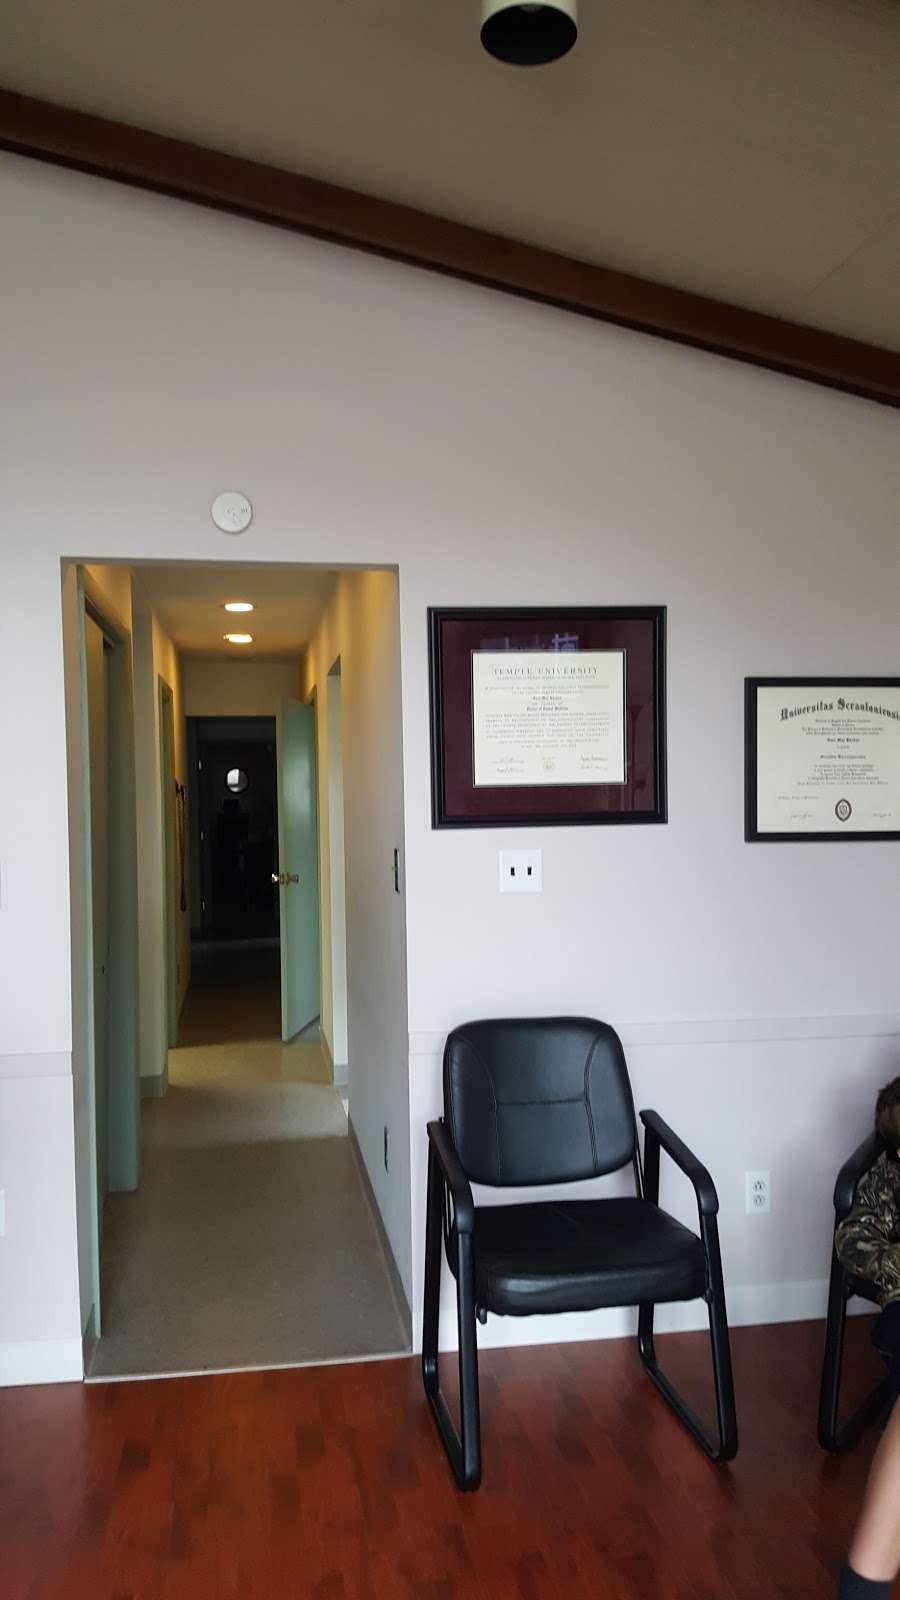 Sare Rhodes DMD - dentist  | Photo 1 of 2 | Address: 161 Bridge St, Tunkhannock, PA 18657, USA | Phone: (570) 836-8942